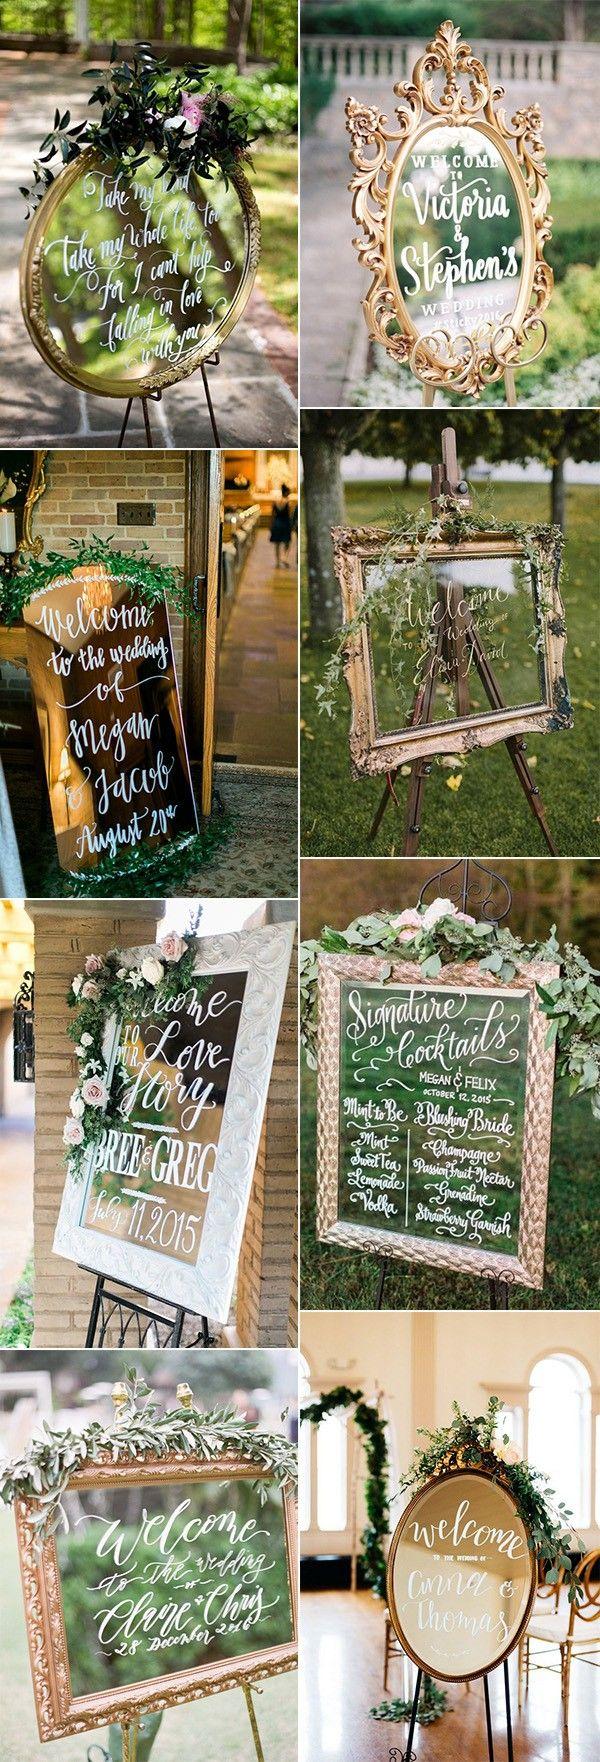 Wedding decorations vintage october 2018  Brilliant Vintage Mirror Wedding Sign Ideas for   Gowns